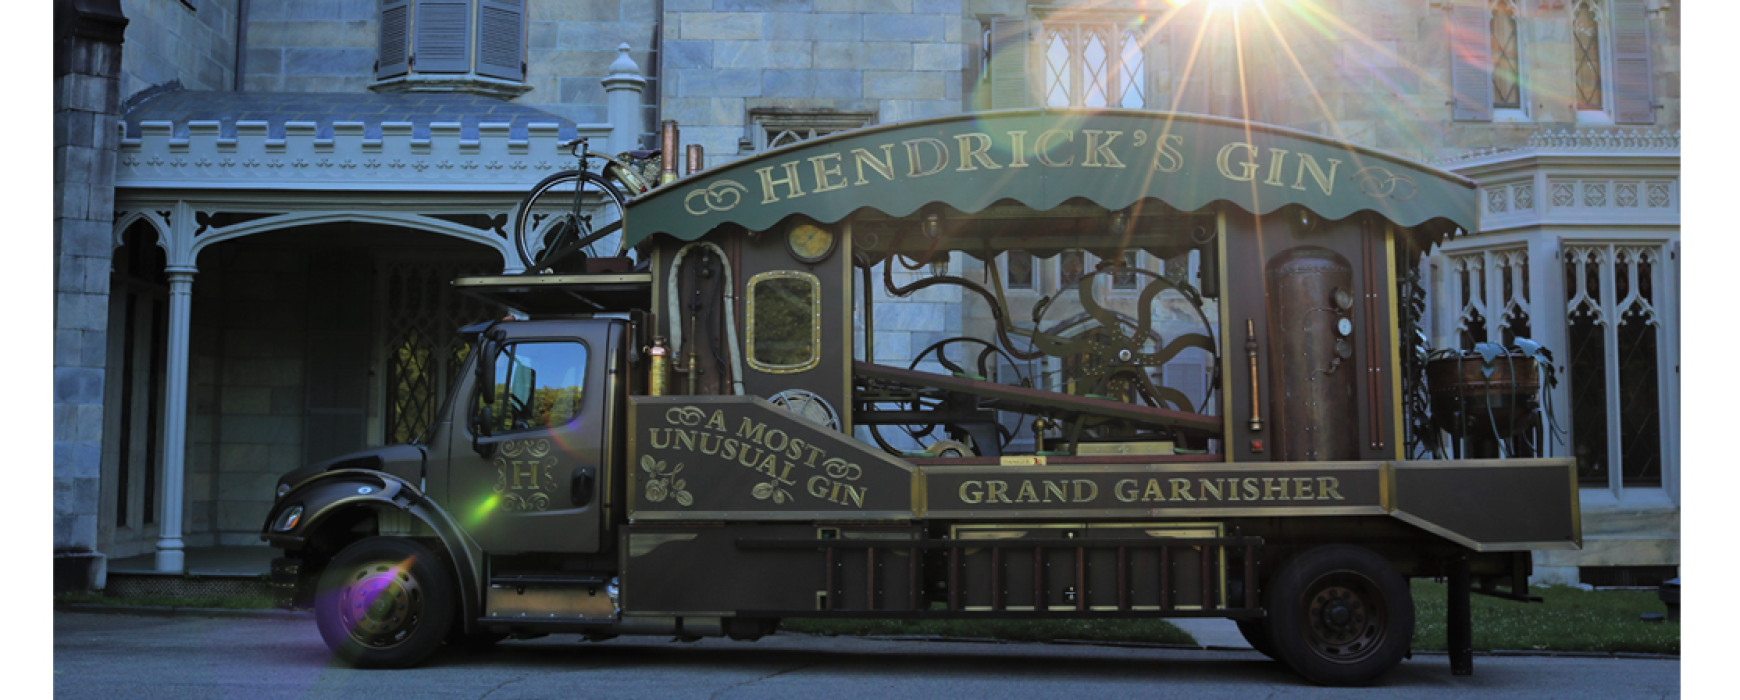 Hendricks Gin Grand Garnisher